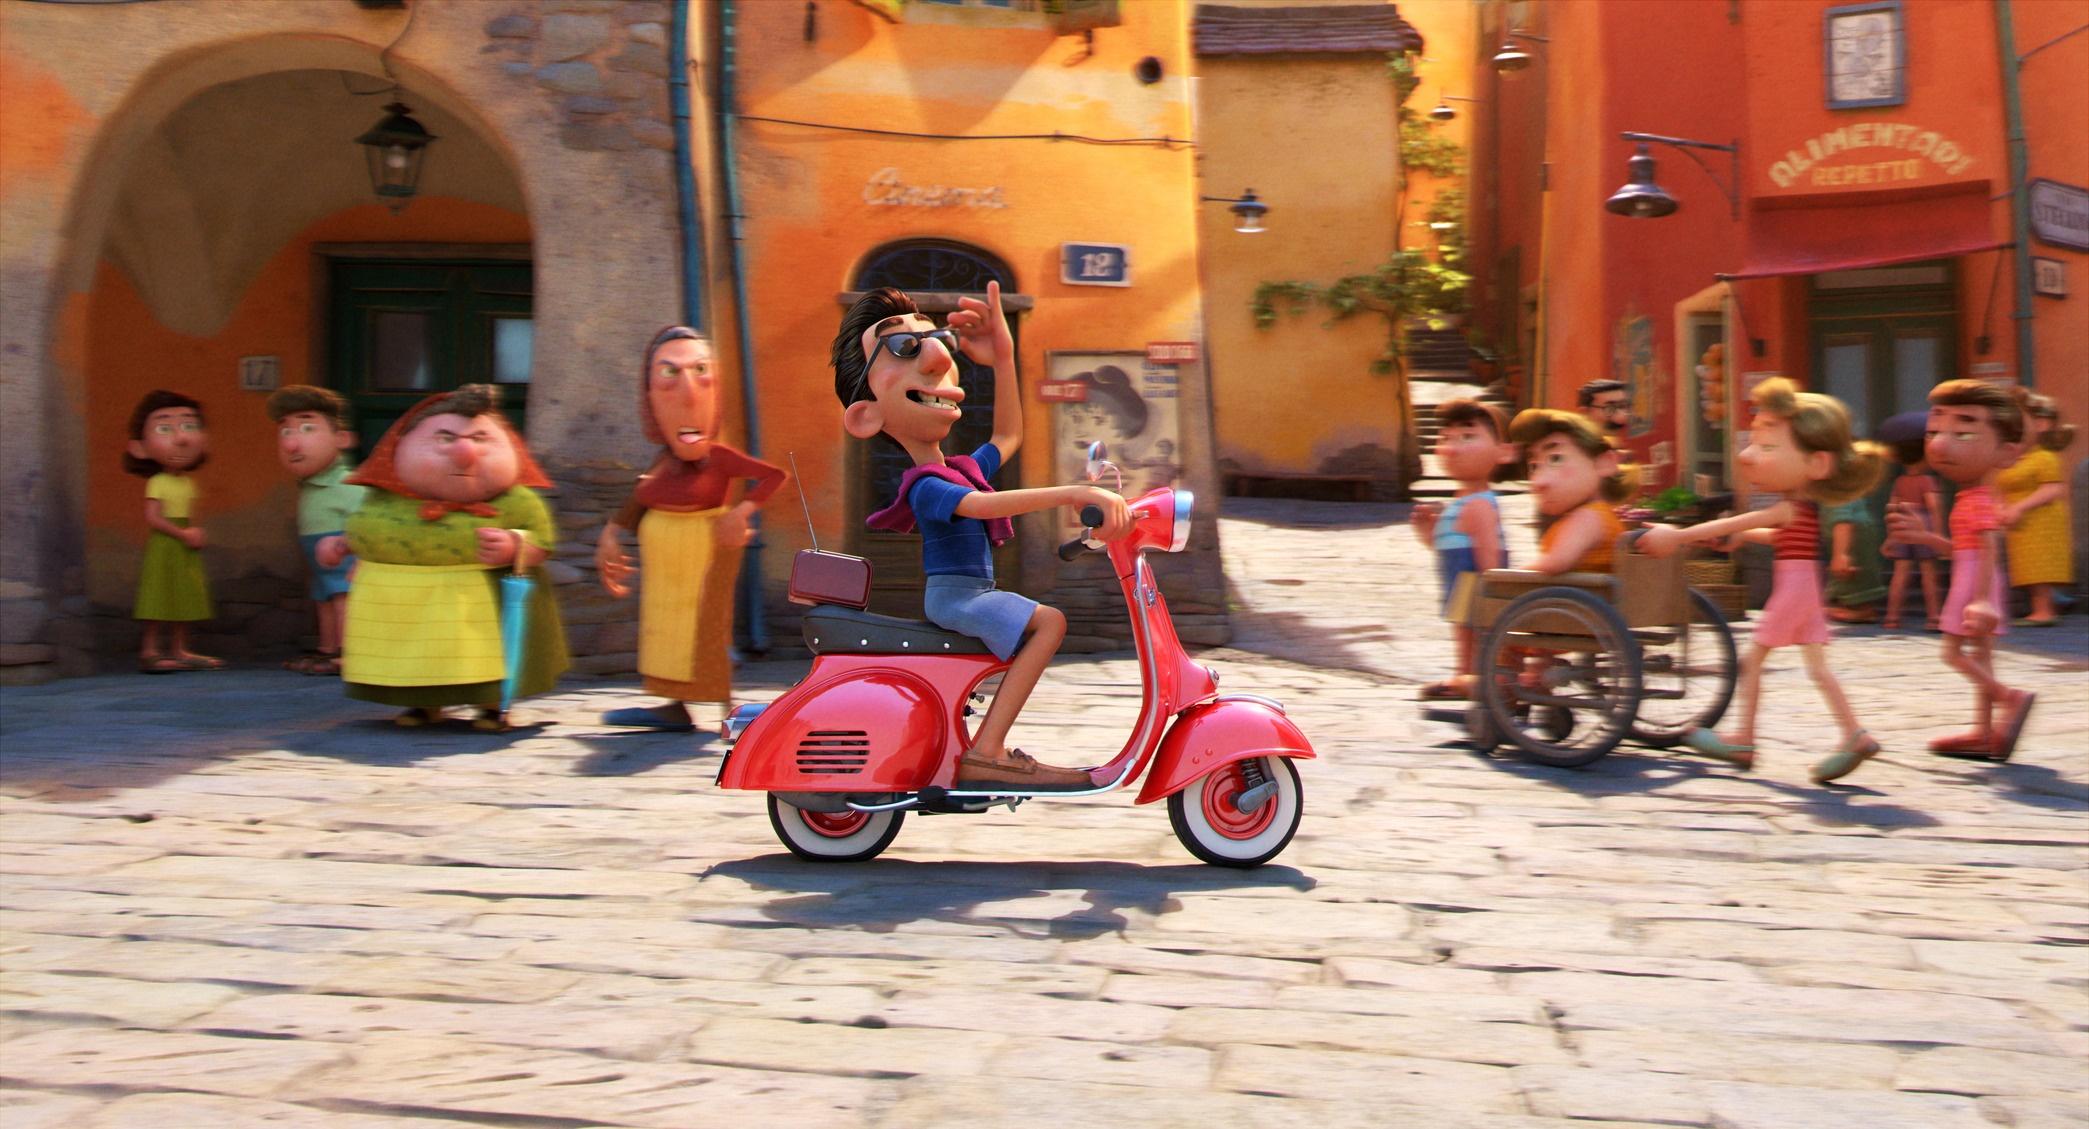 Luca recensione film d'animazione Disney Pixar Enrico Casarosa [Disney+]